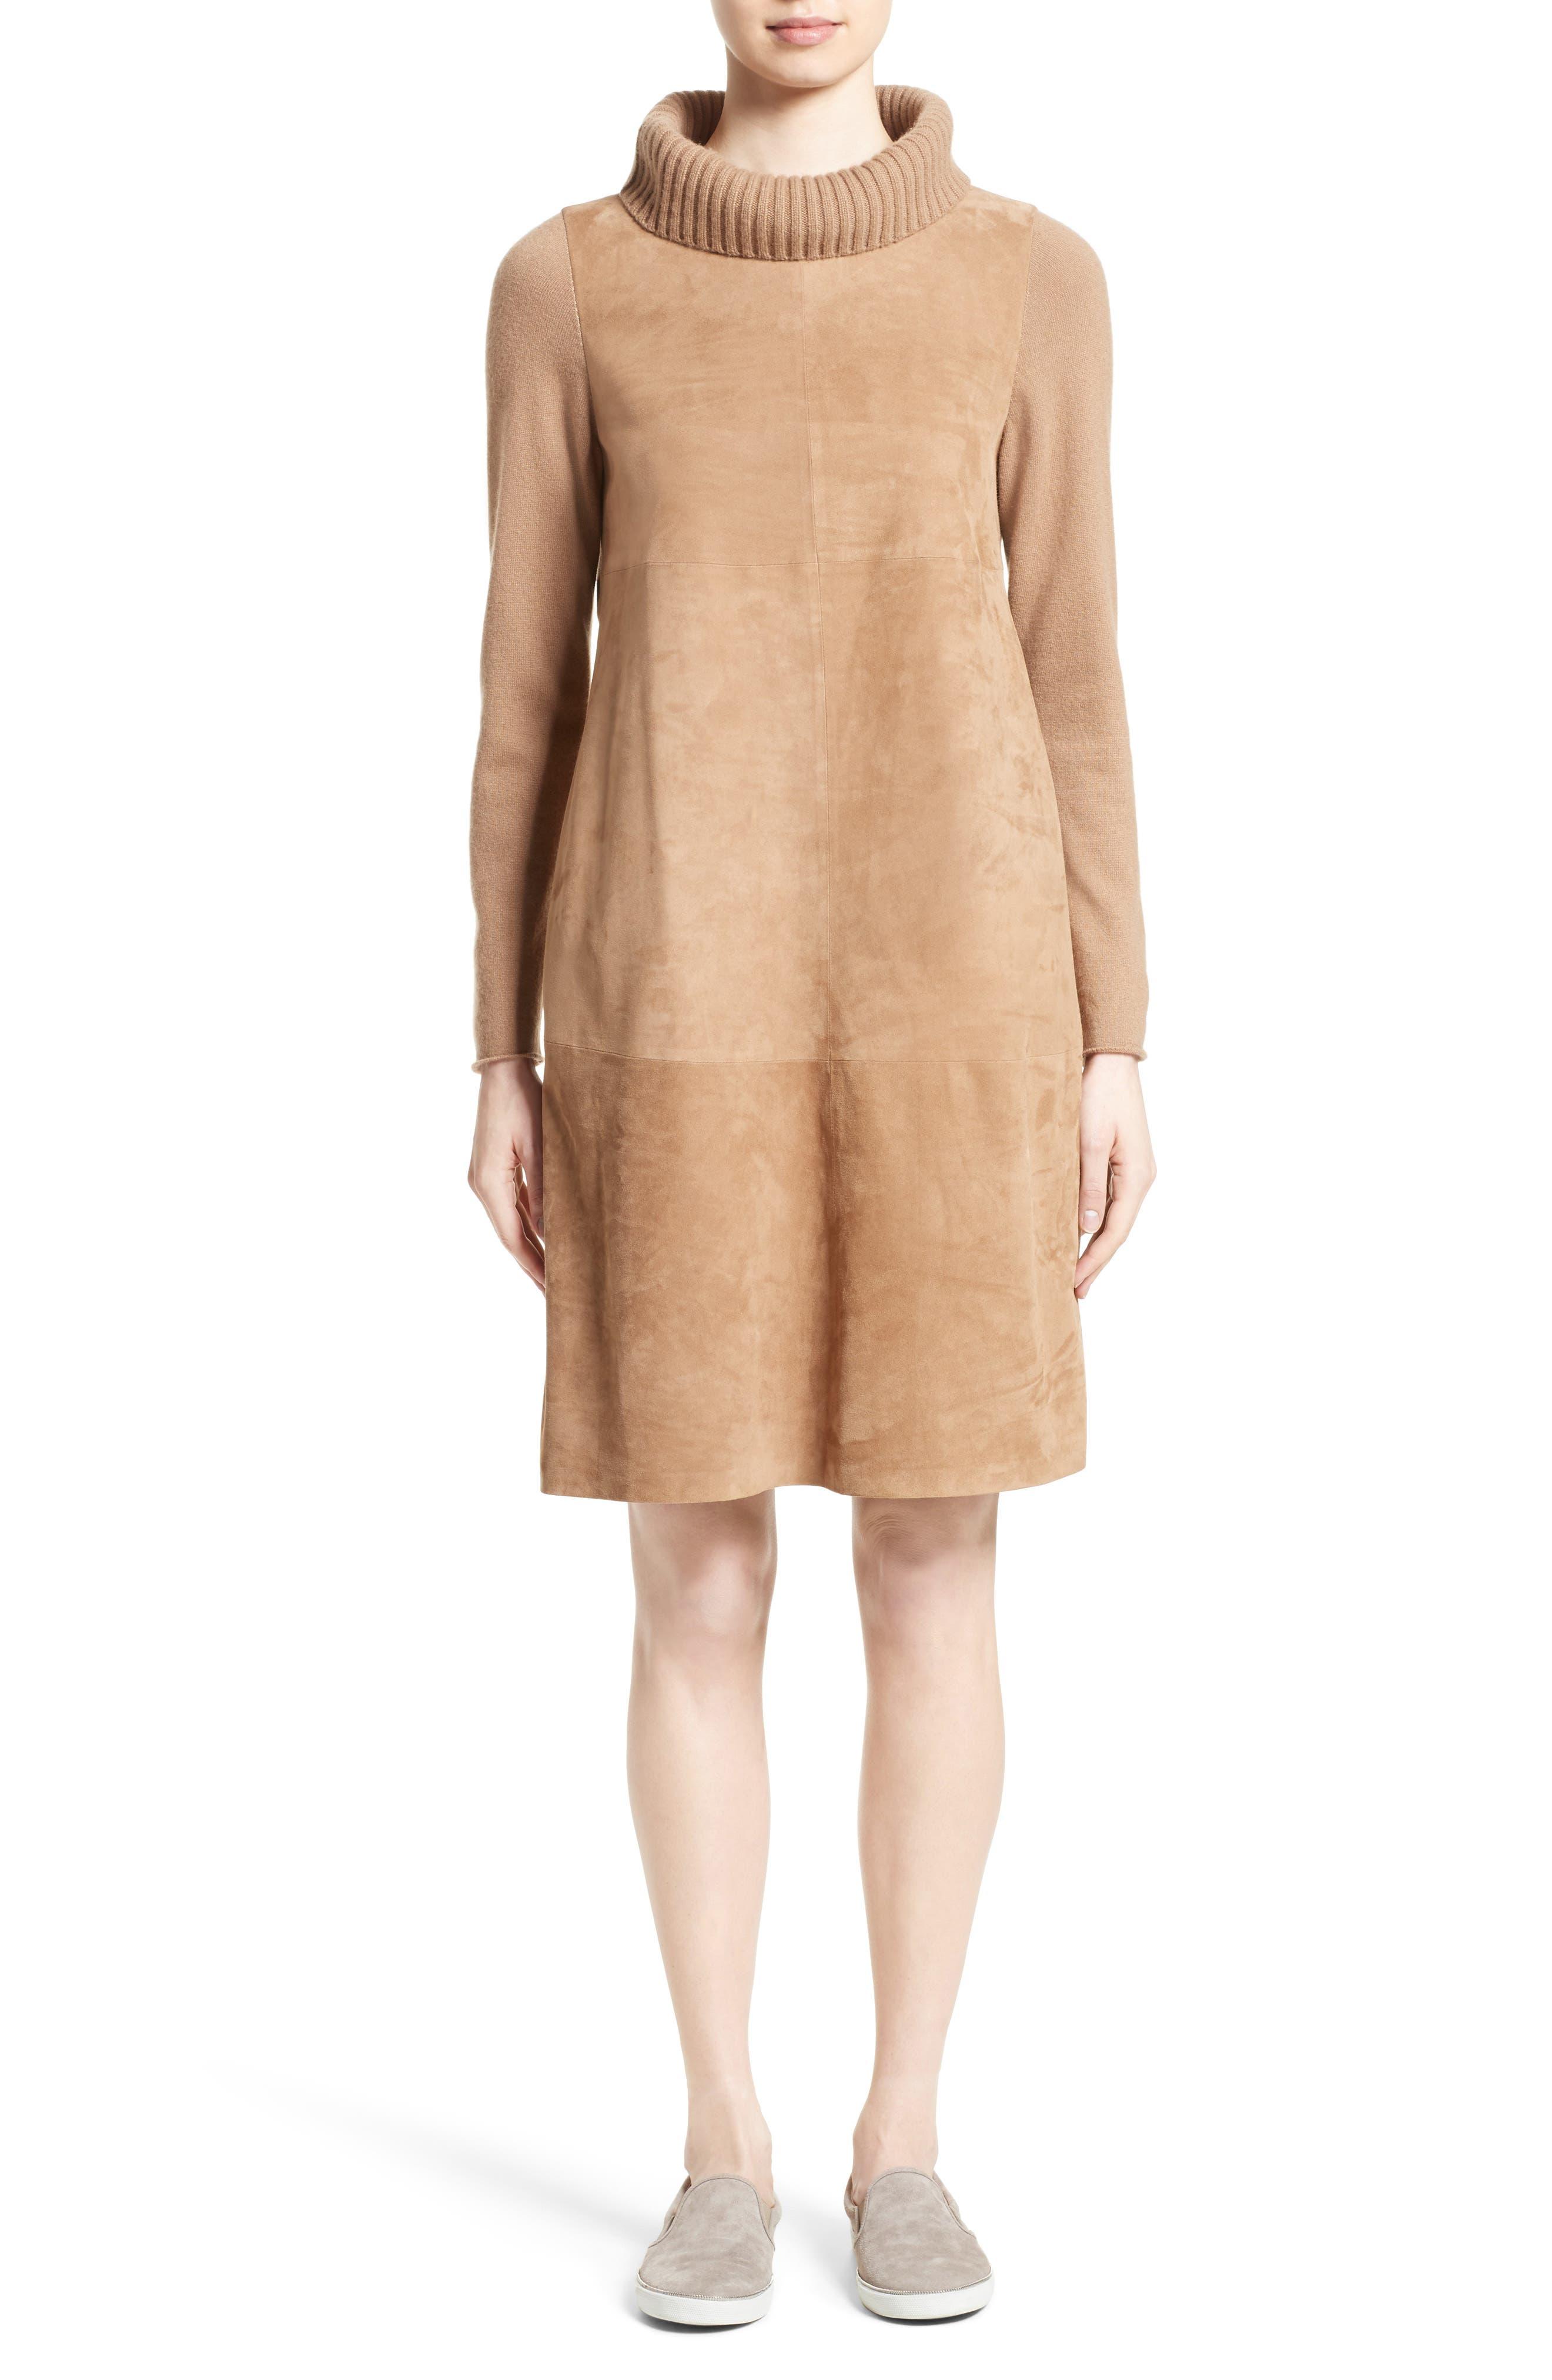 Main Image - Fabiana Filippi Suede & Cashmere Dress